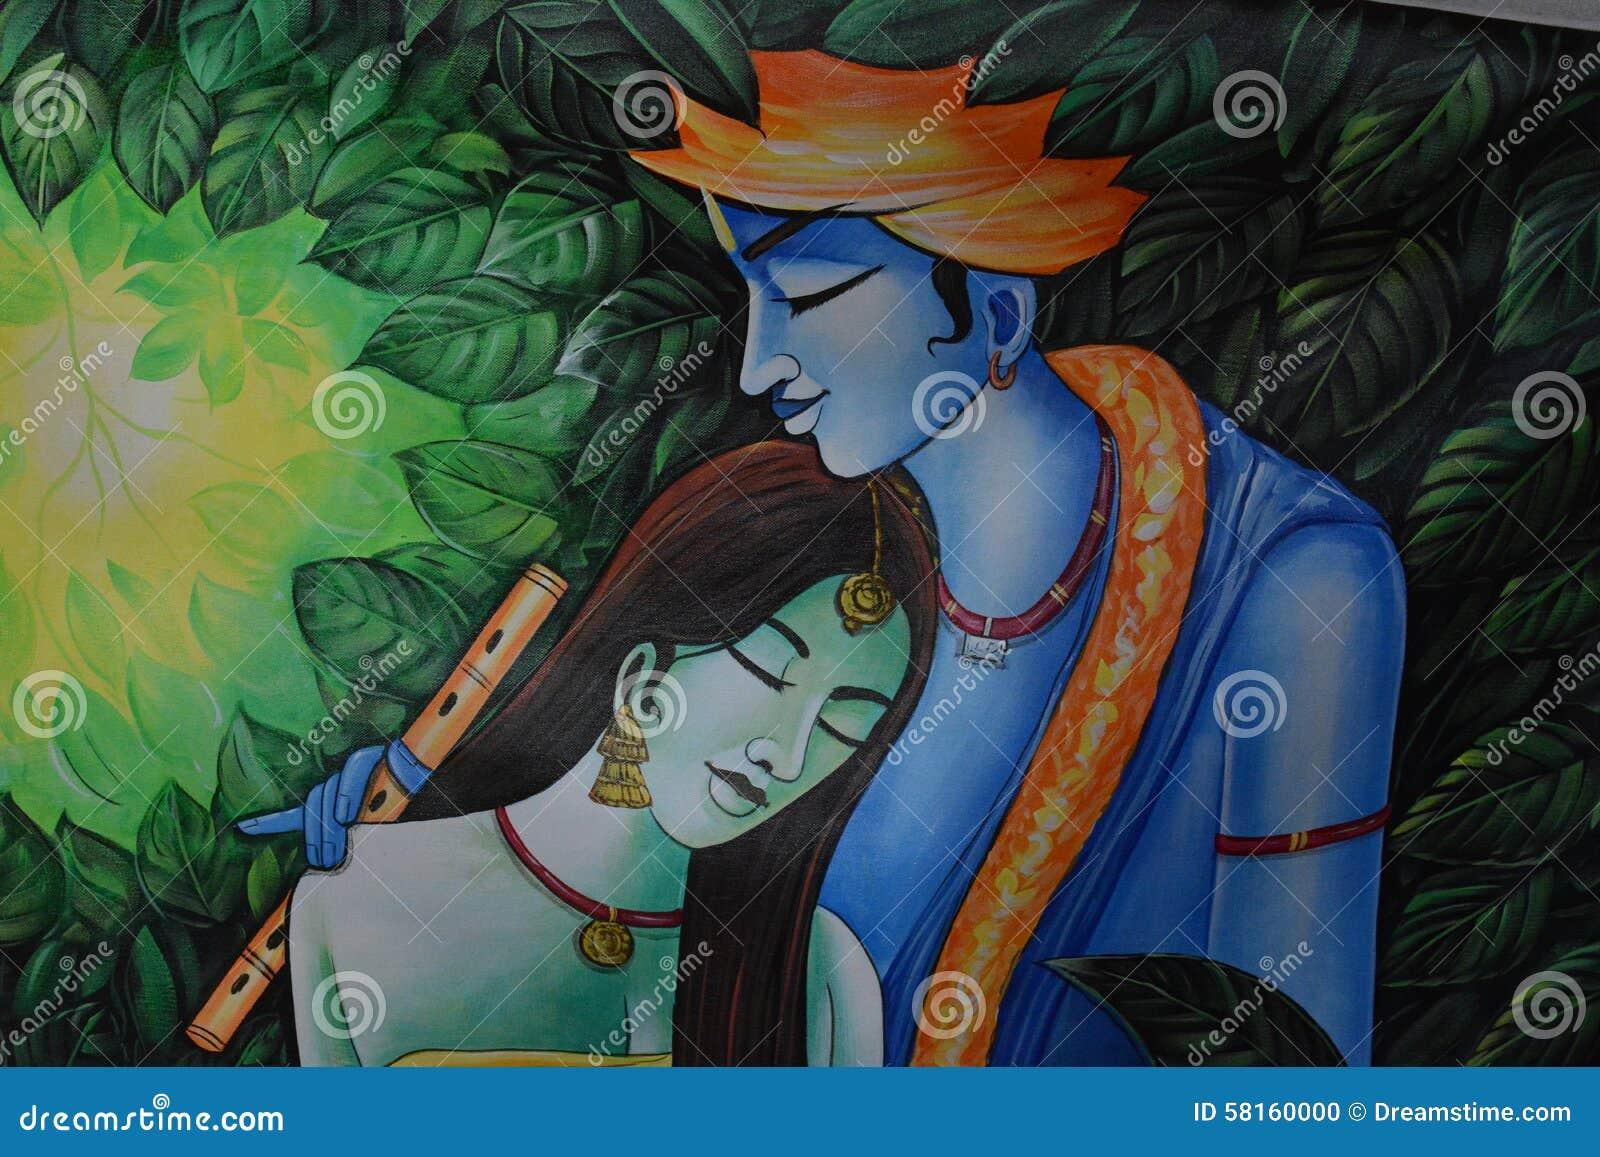 Radha krishna 3d wallpapers, radhe krishan high quality wallpapers.